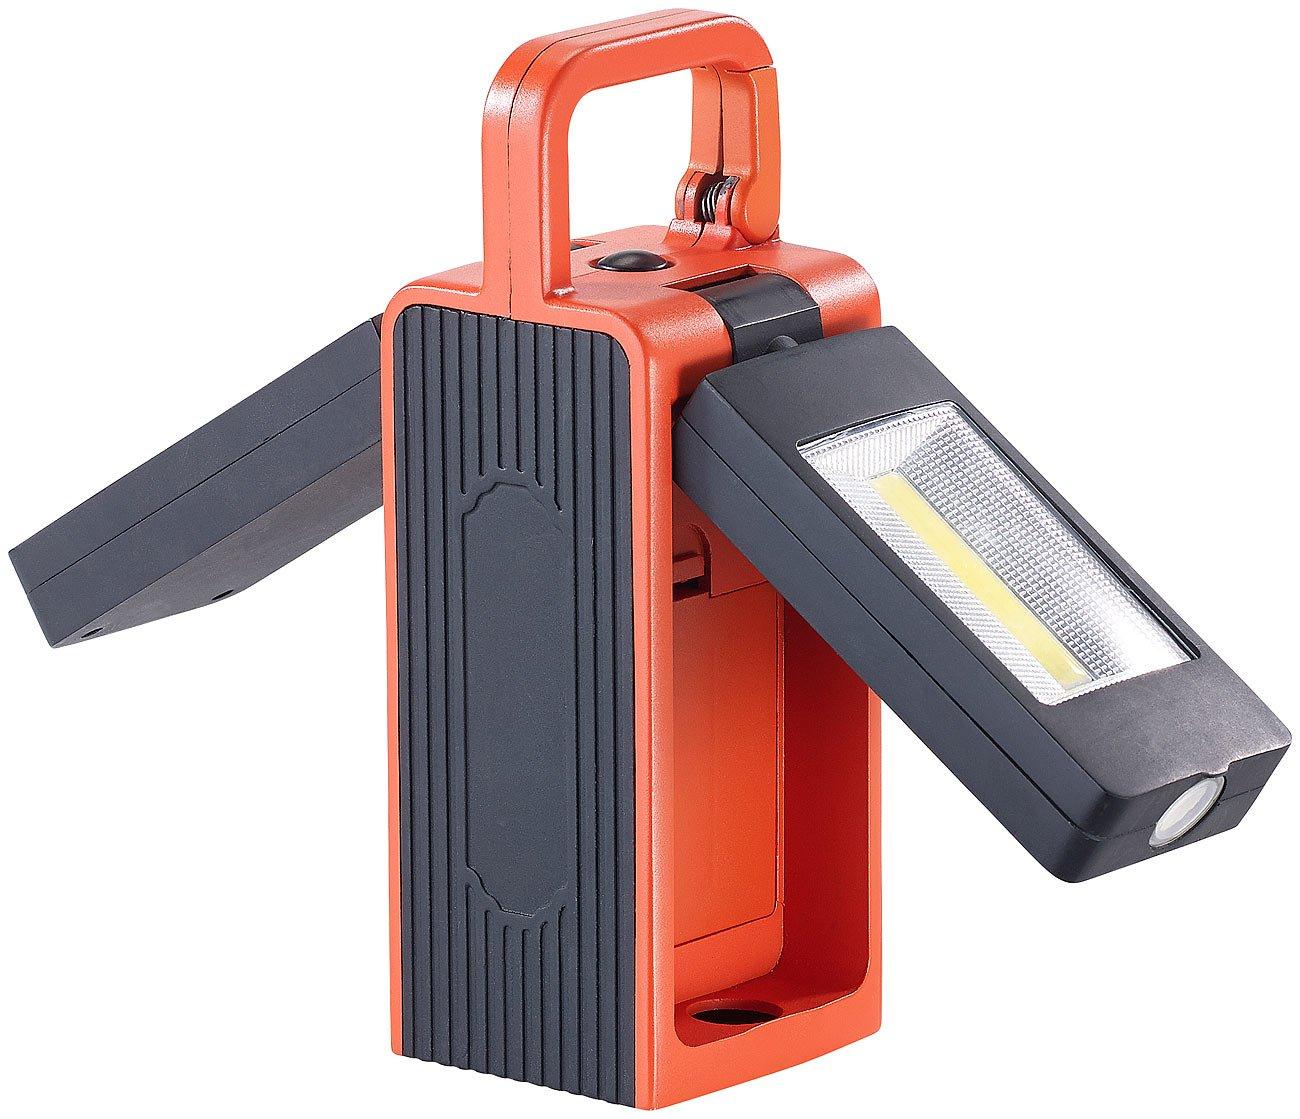 Neodym-Magnet 8W 325lm,IP44 COB-LEDs Werkstattlampen 3 Modi Lunartec Arbeitslampen: Arbeitsleuchte AL-525